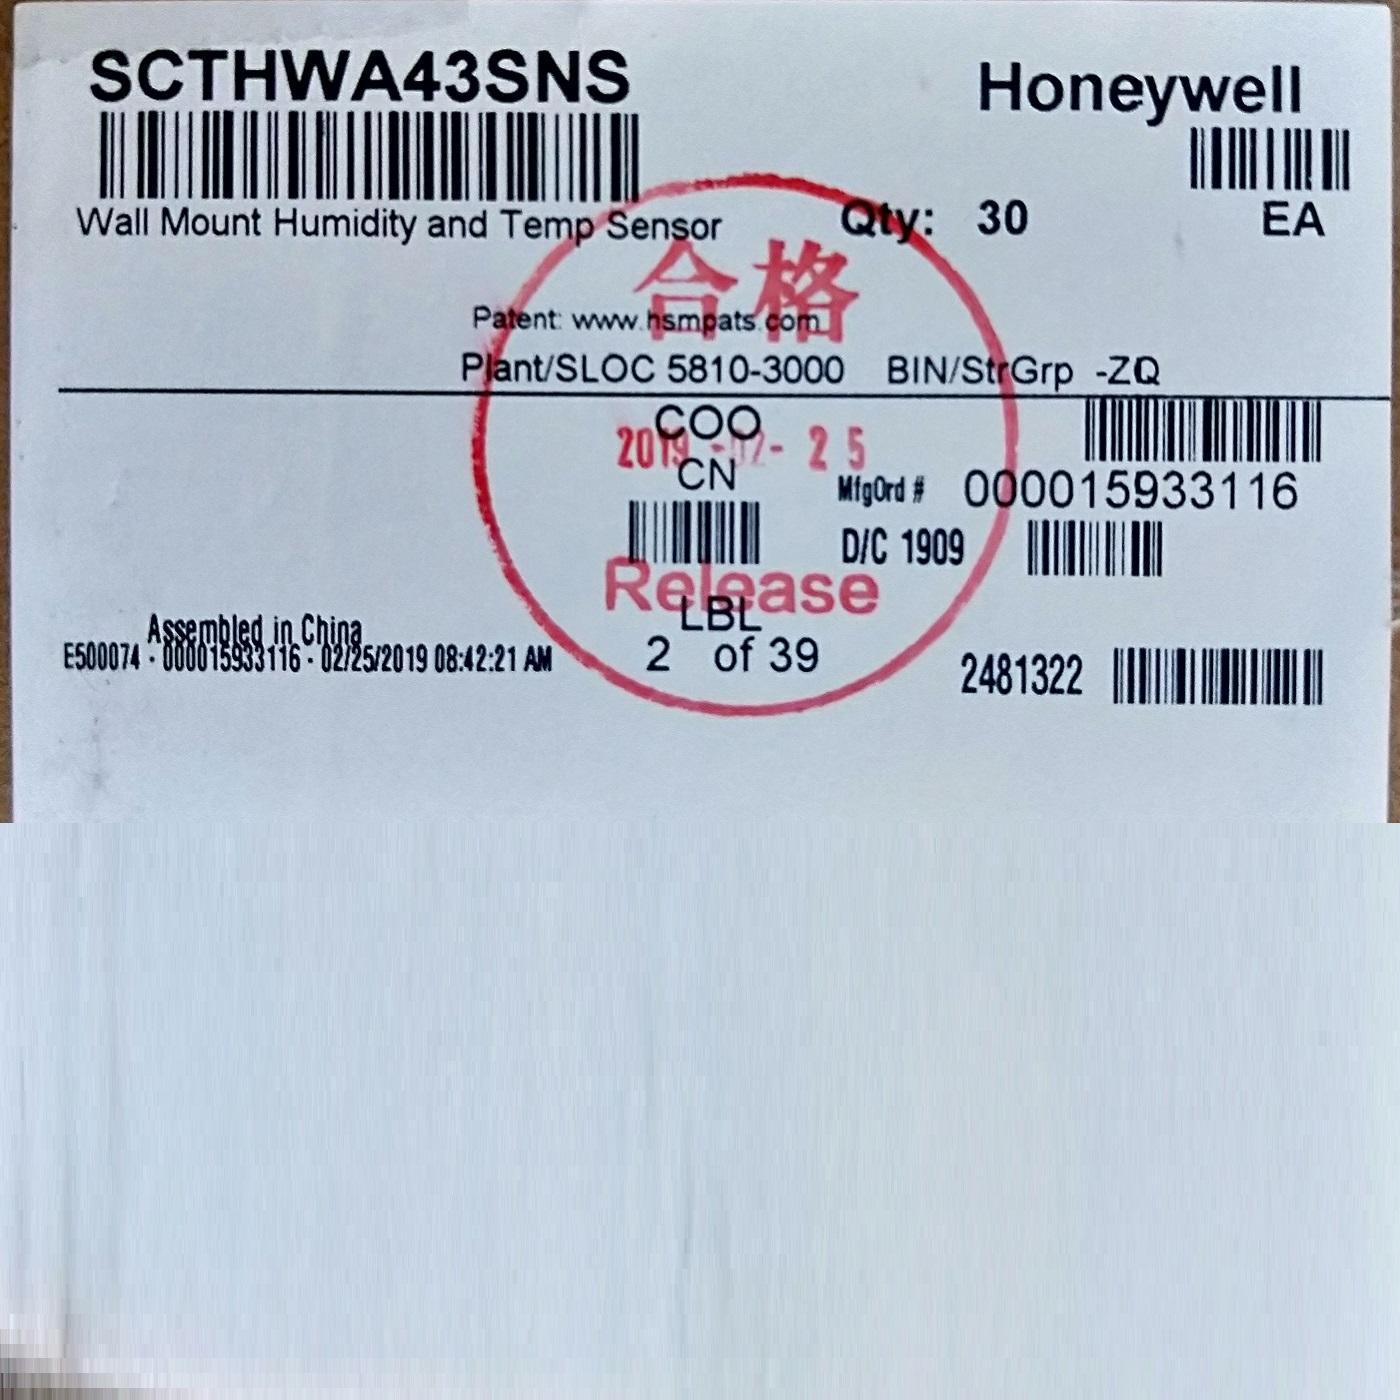 SCTHWA43SNS-合格证.jpg